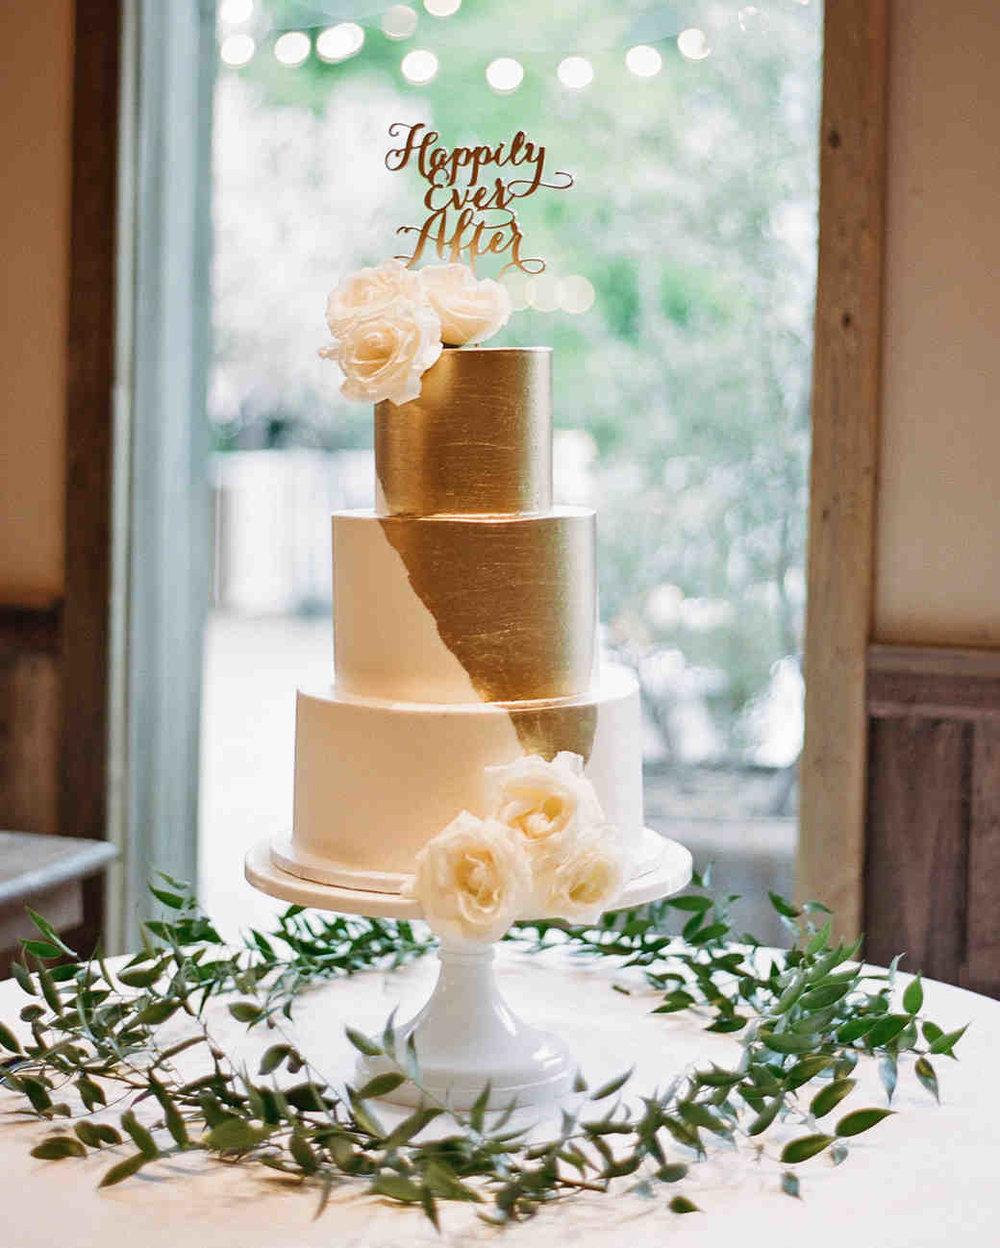 shannon-jon-wedding-cake-0682-6238579-0117_vert.jpg